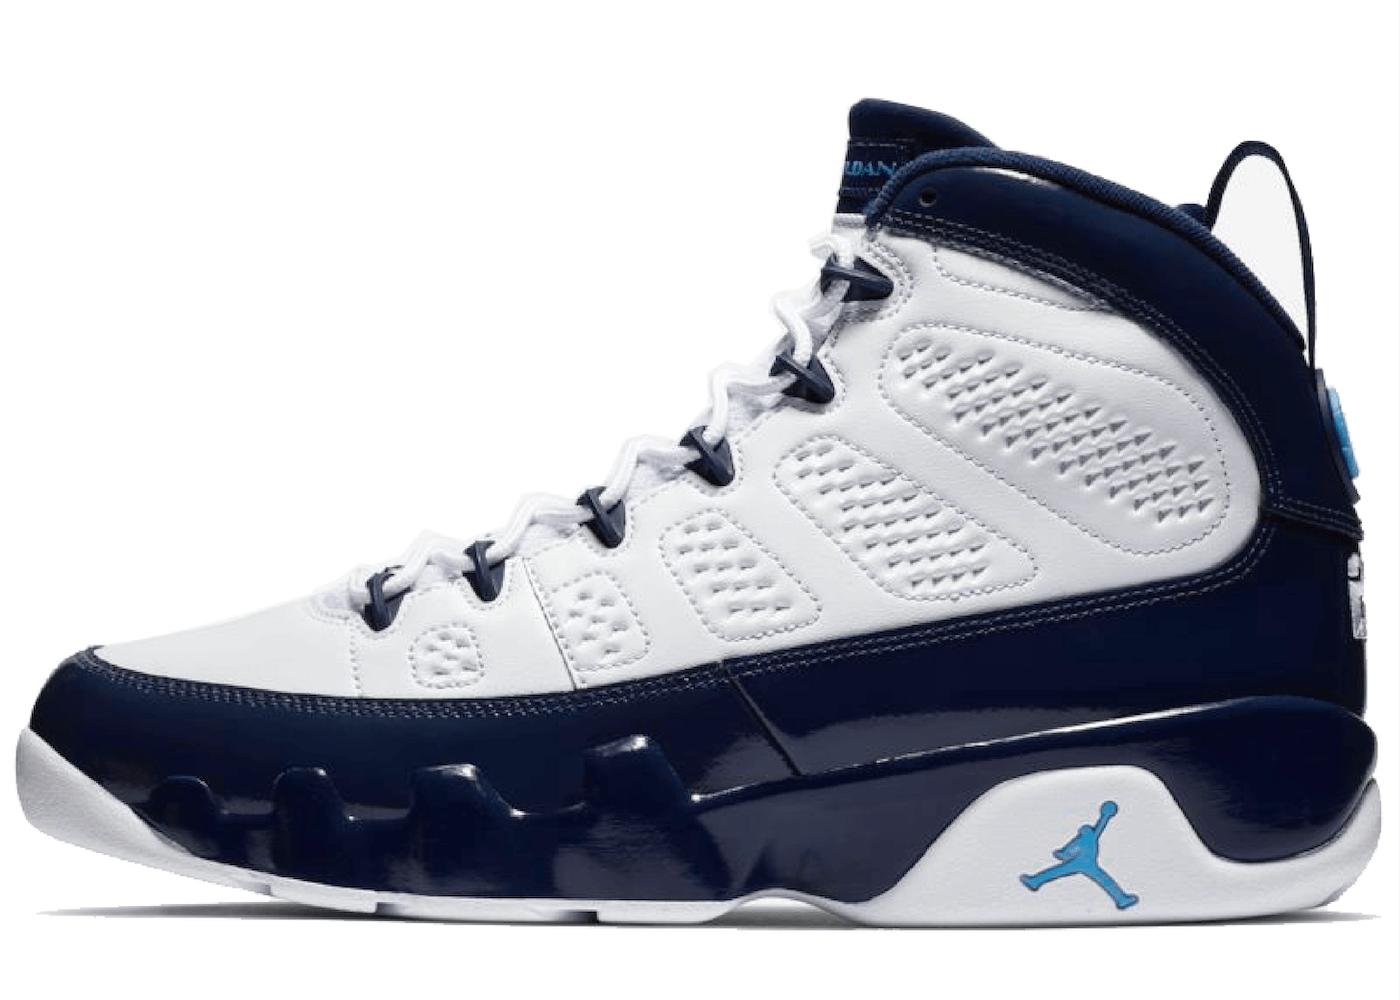 Nike Air Jordan 9 Retro Blue Pearlの写真